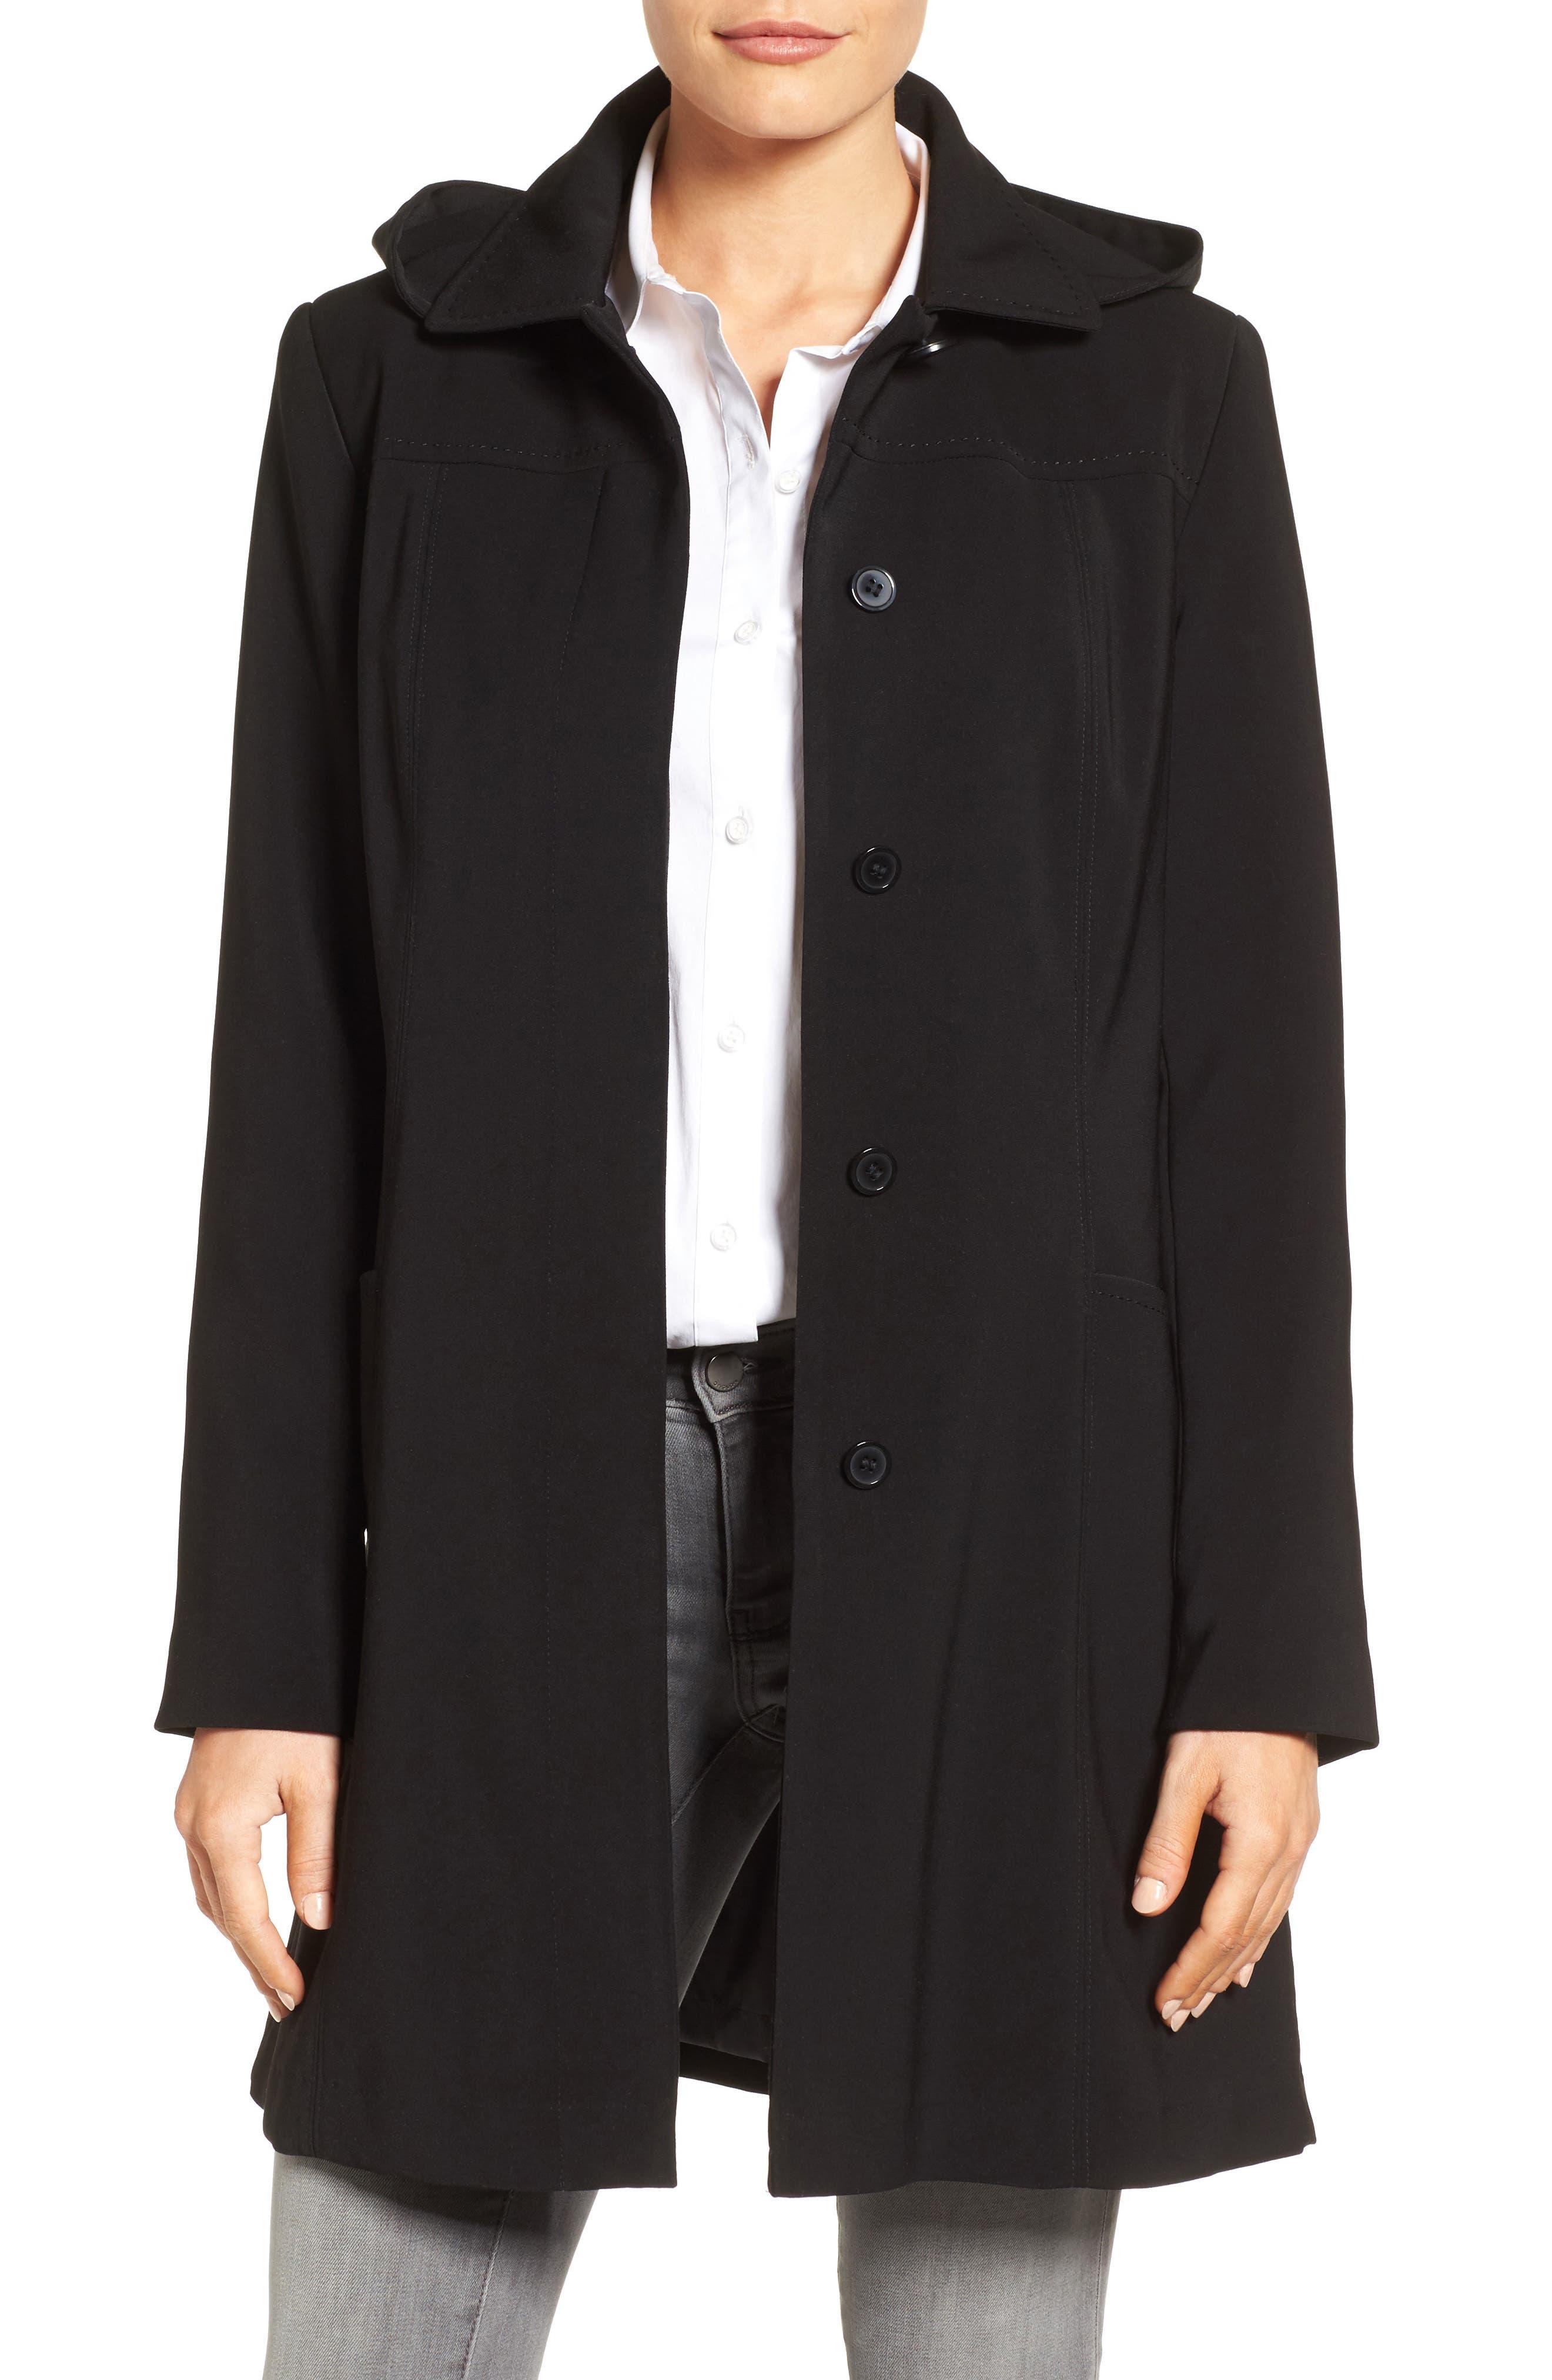 Gallery Pickstitch Nepage Walking Coat with Detachable Hood (Regular & Petite)